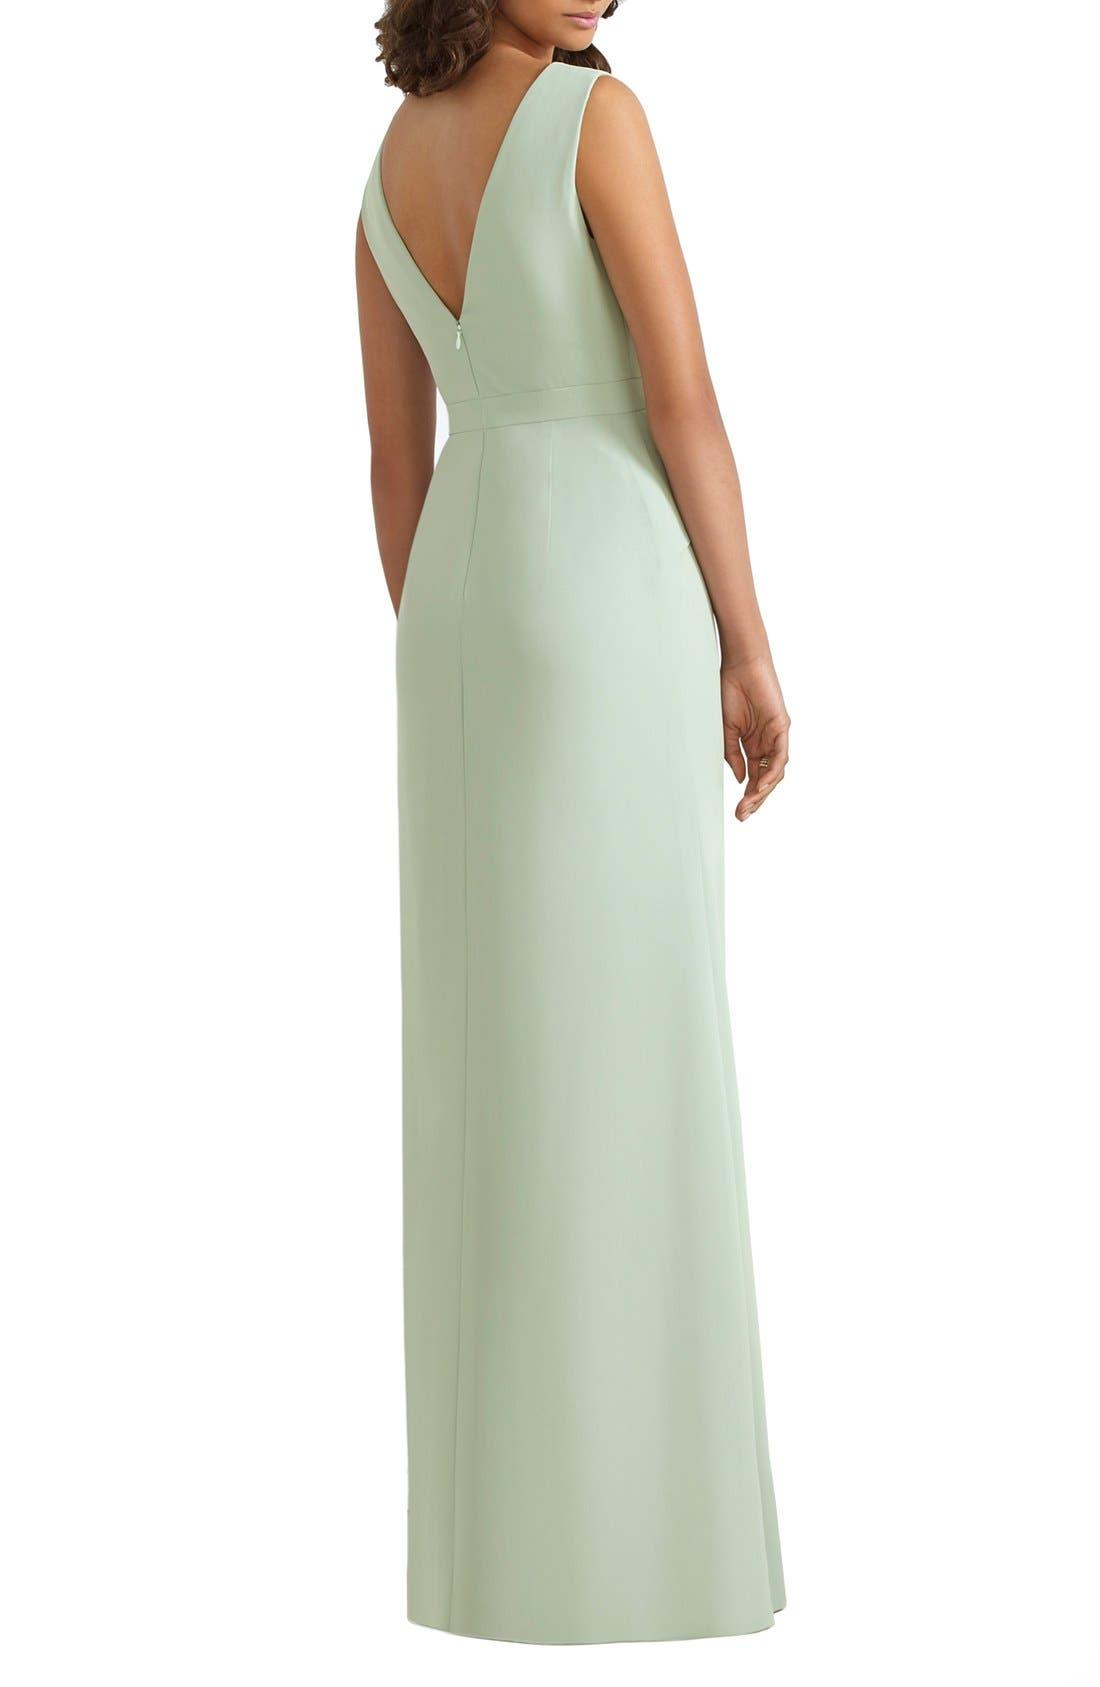 Alternate Image 2  - Social Bridesmaids Lace Inset V-Neck Peplum Detail Gown